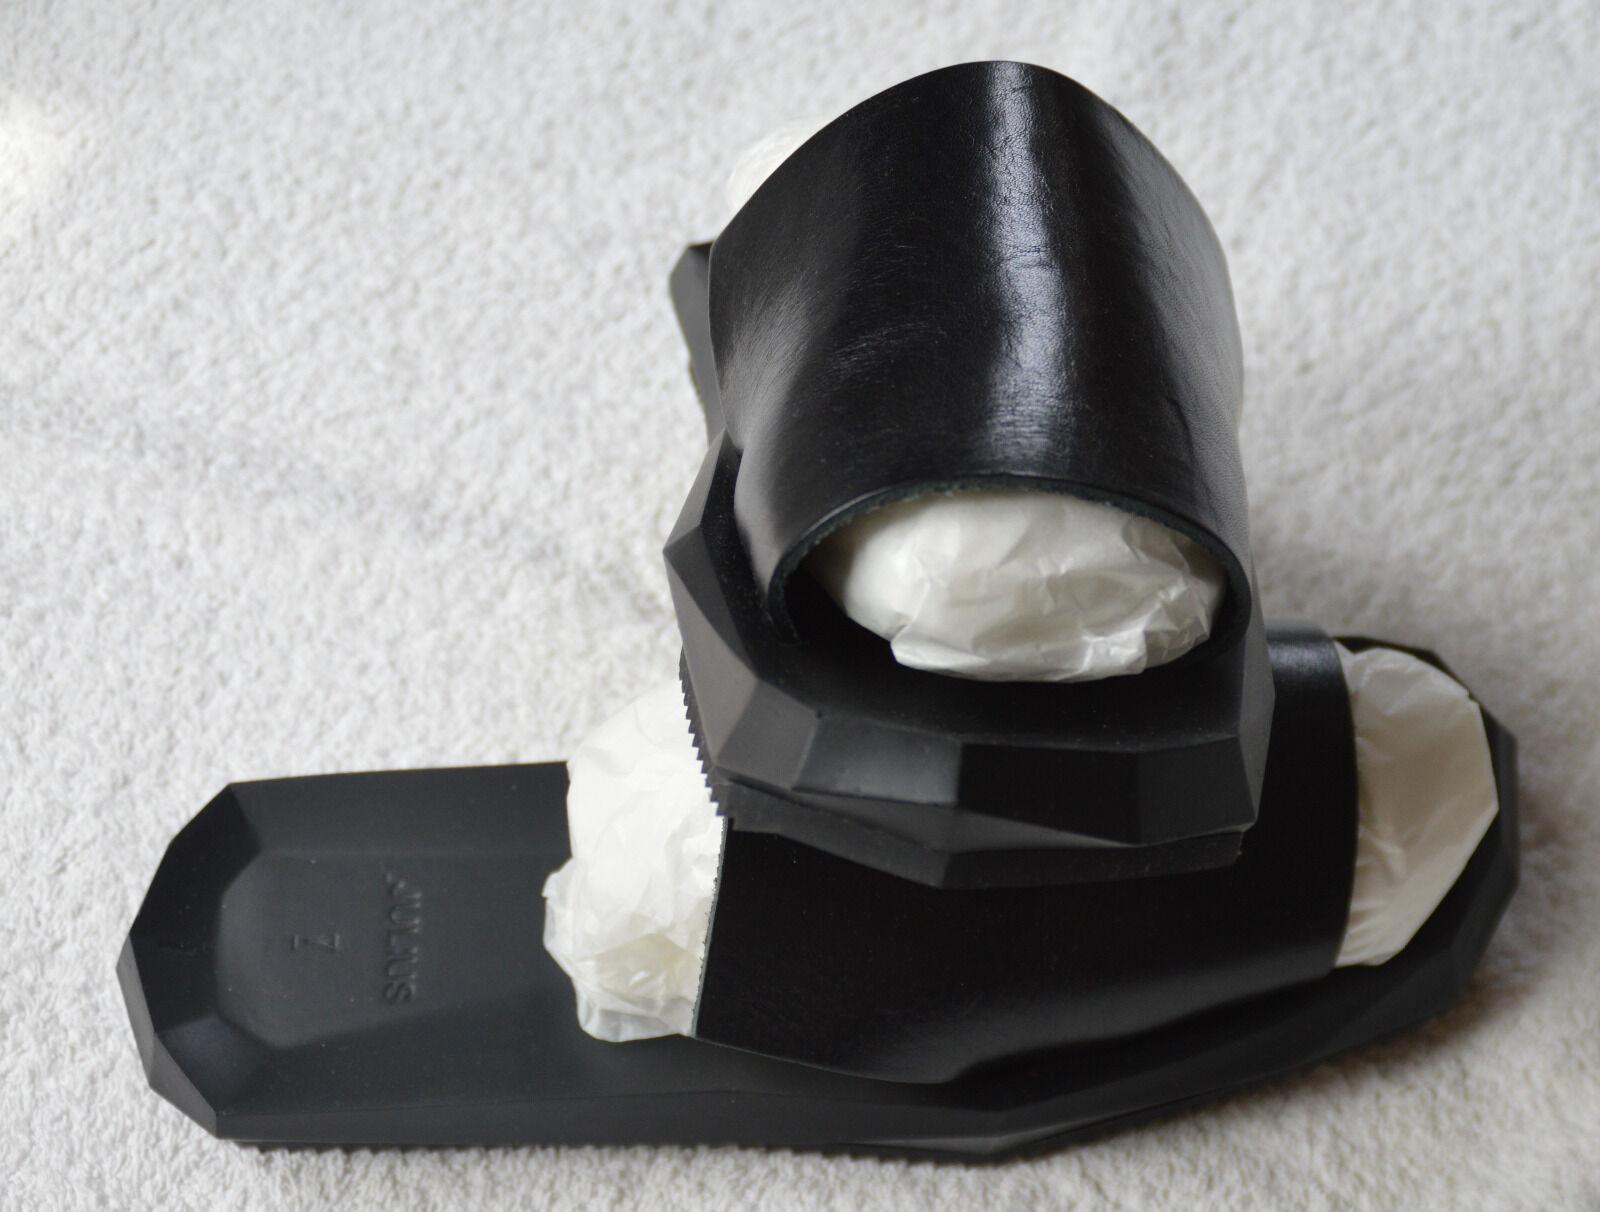 Julius 7 Sandale 53FWM8 1 Layers schwarz Leder Größe 1 53FWM8 85bb71